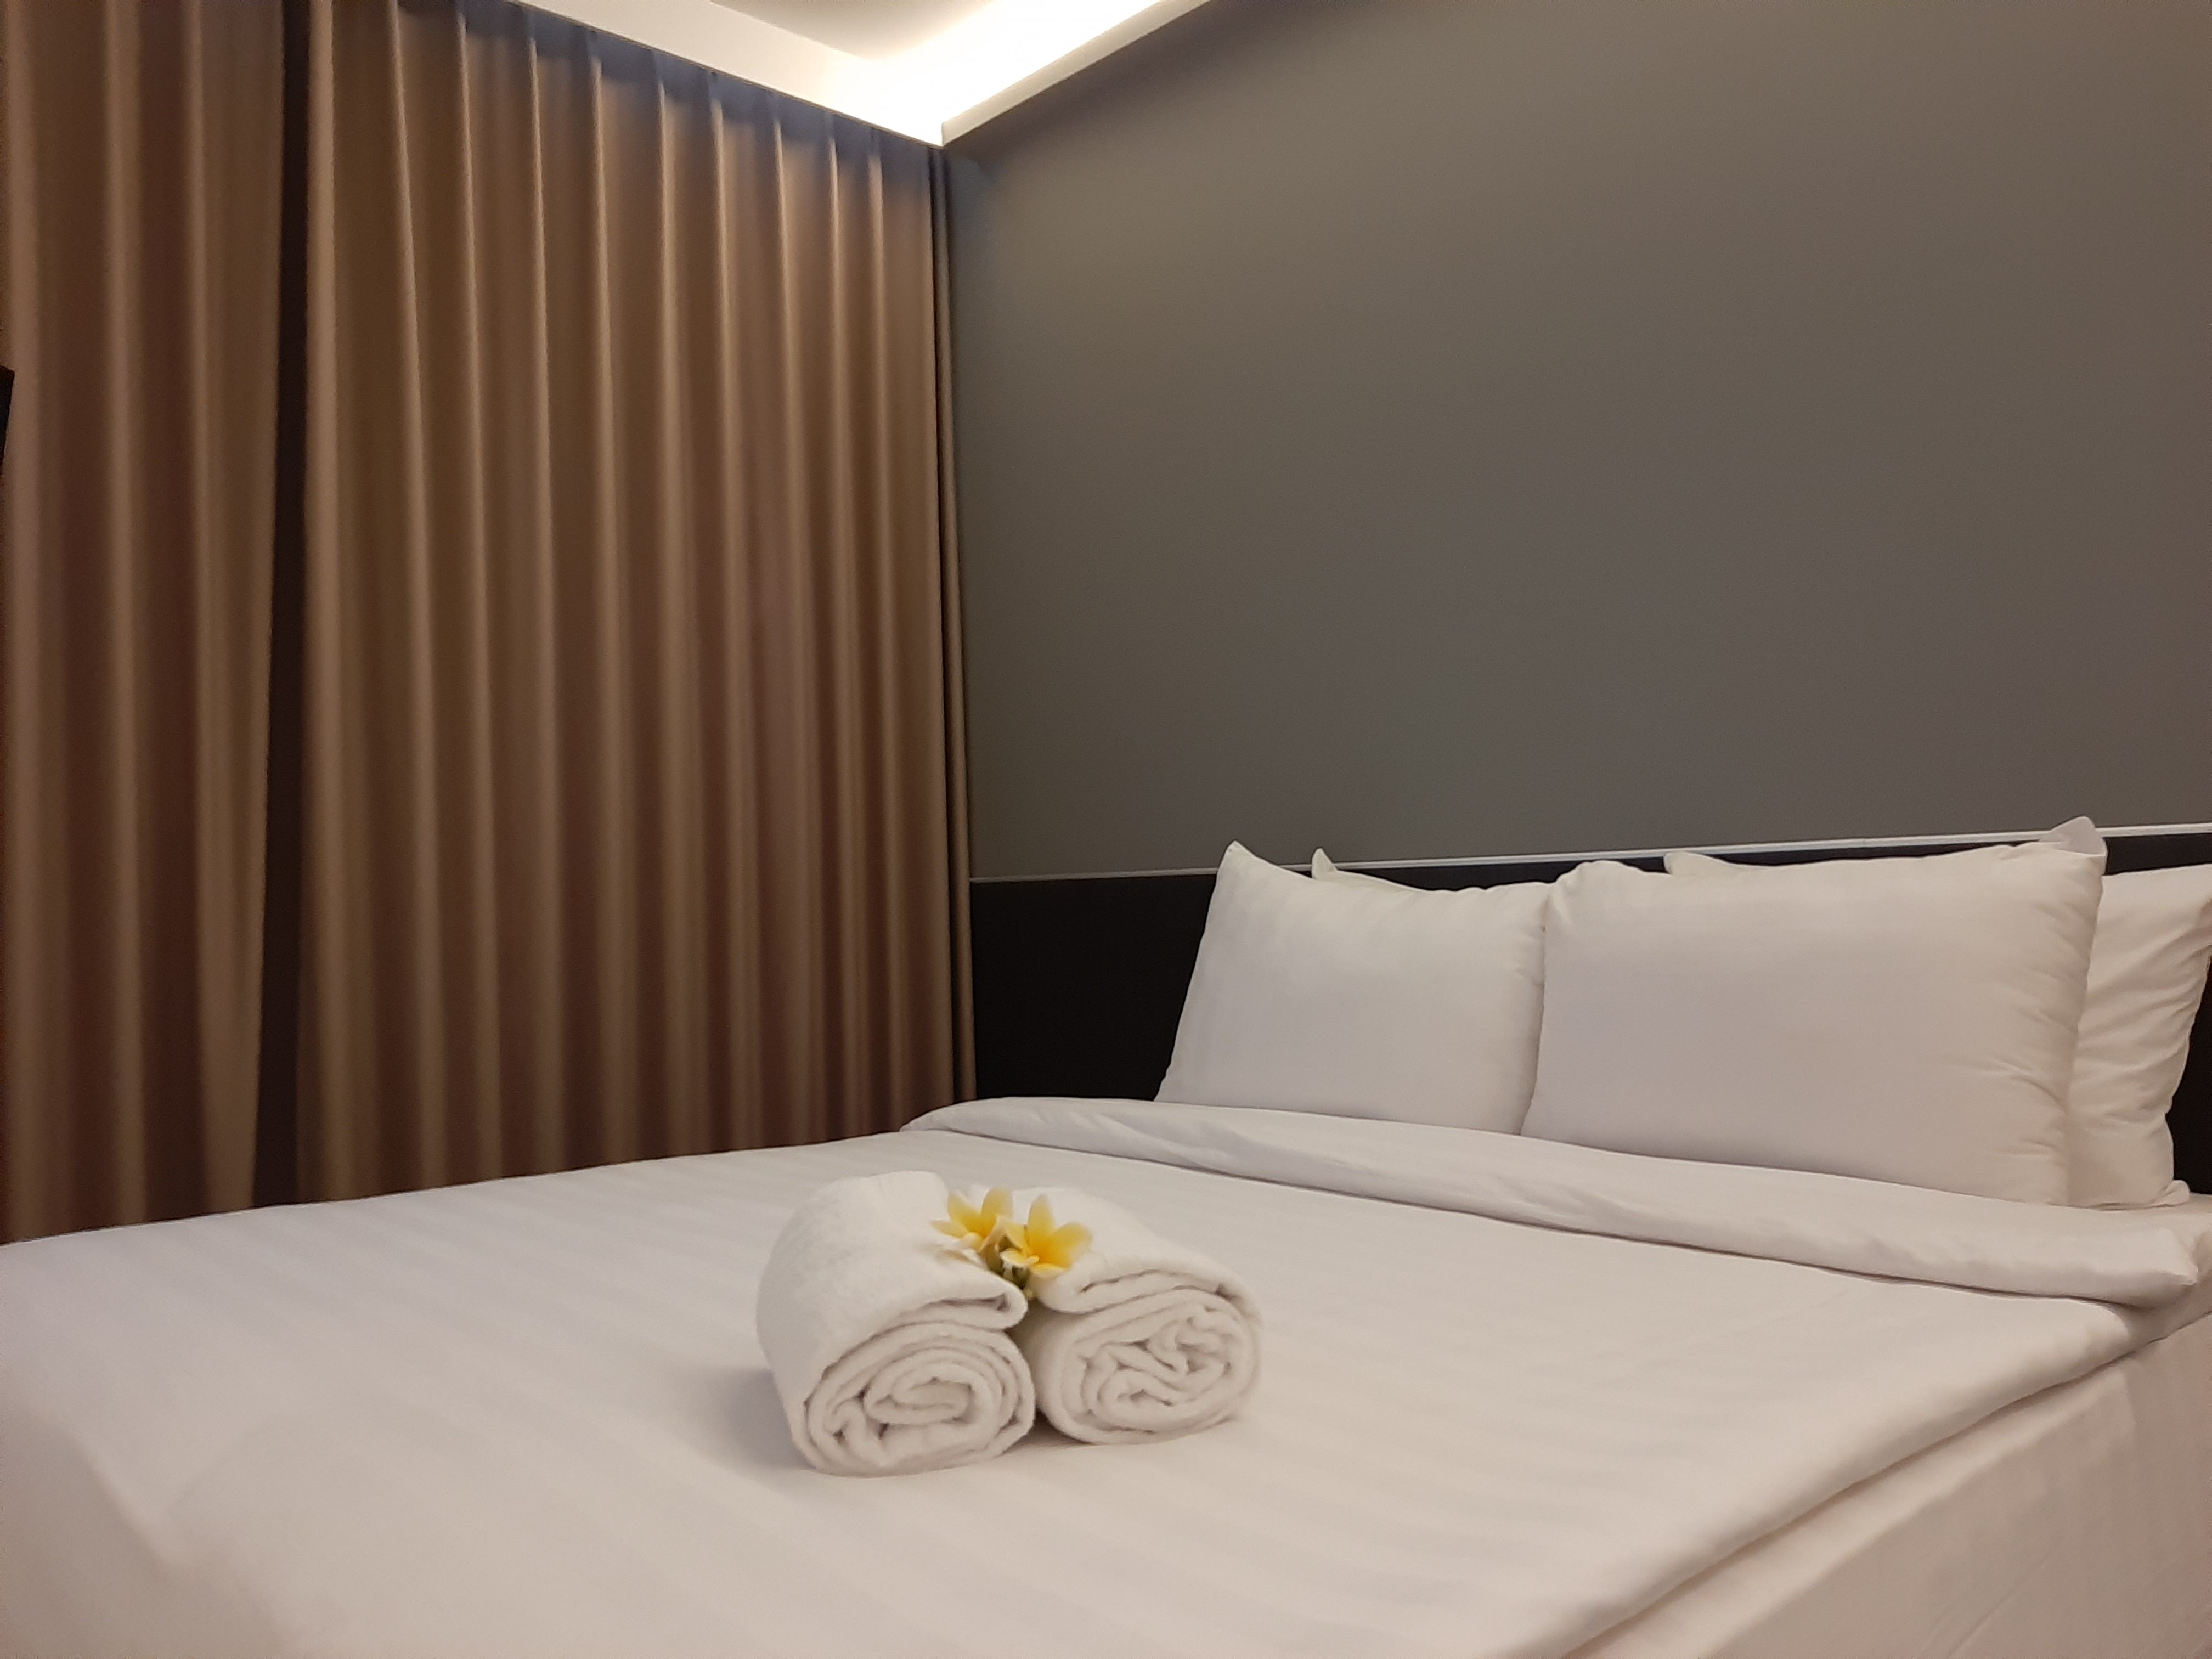 Hotel Pantes Simpanglima Semarang, Semarang